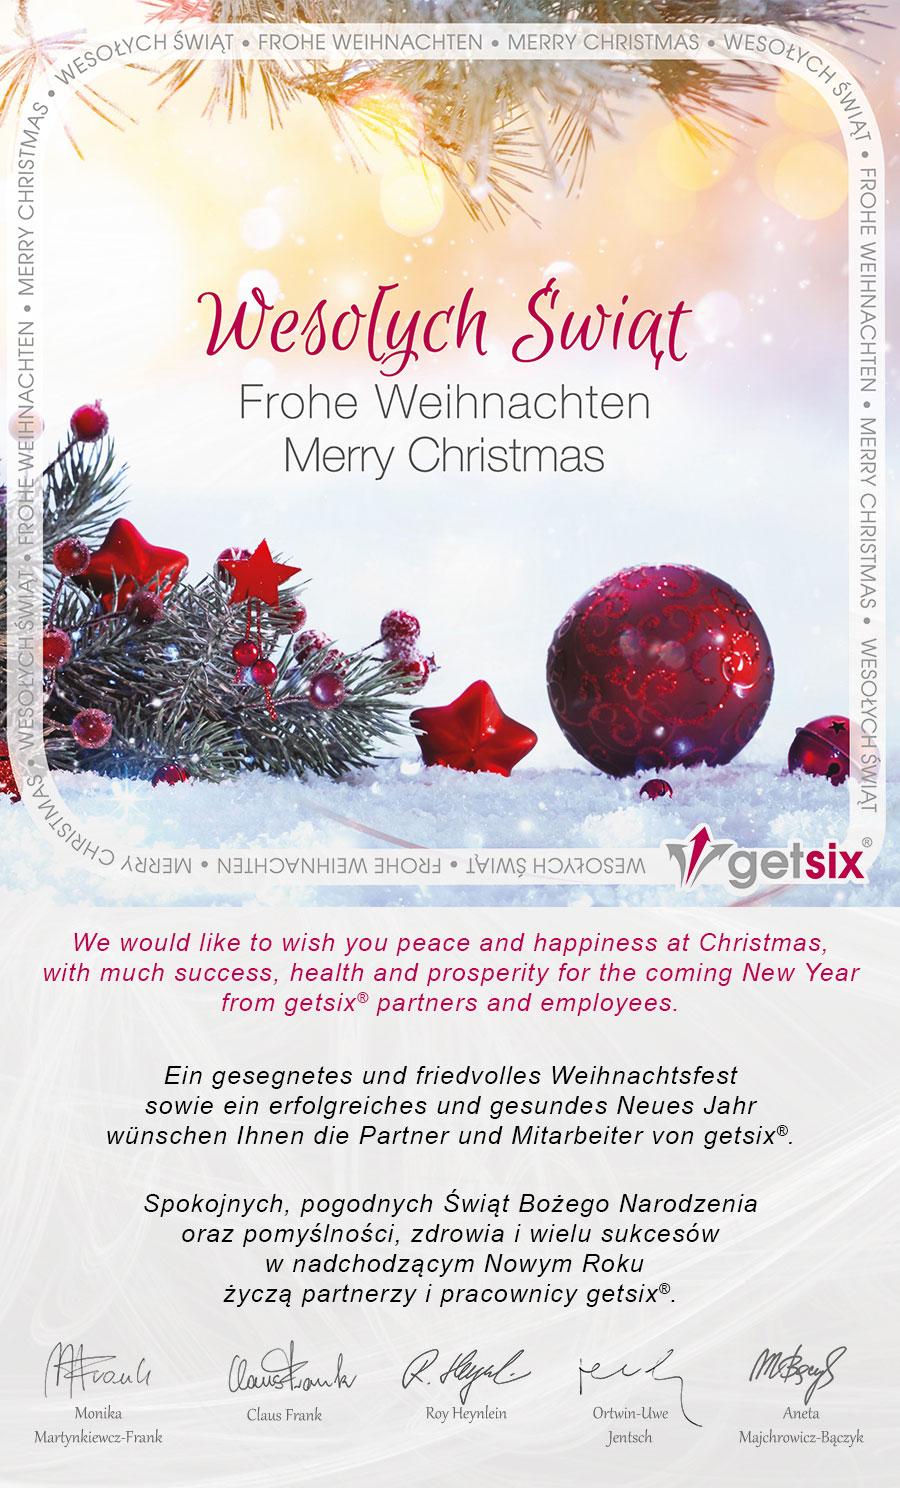 getsix Christmas Card 2020